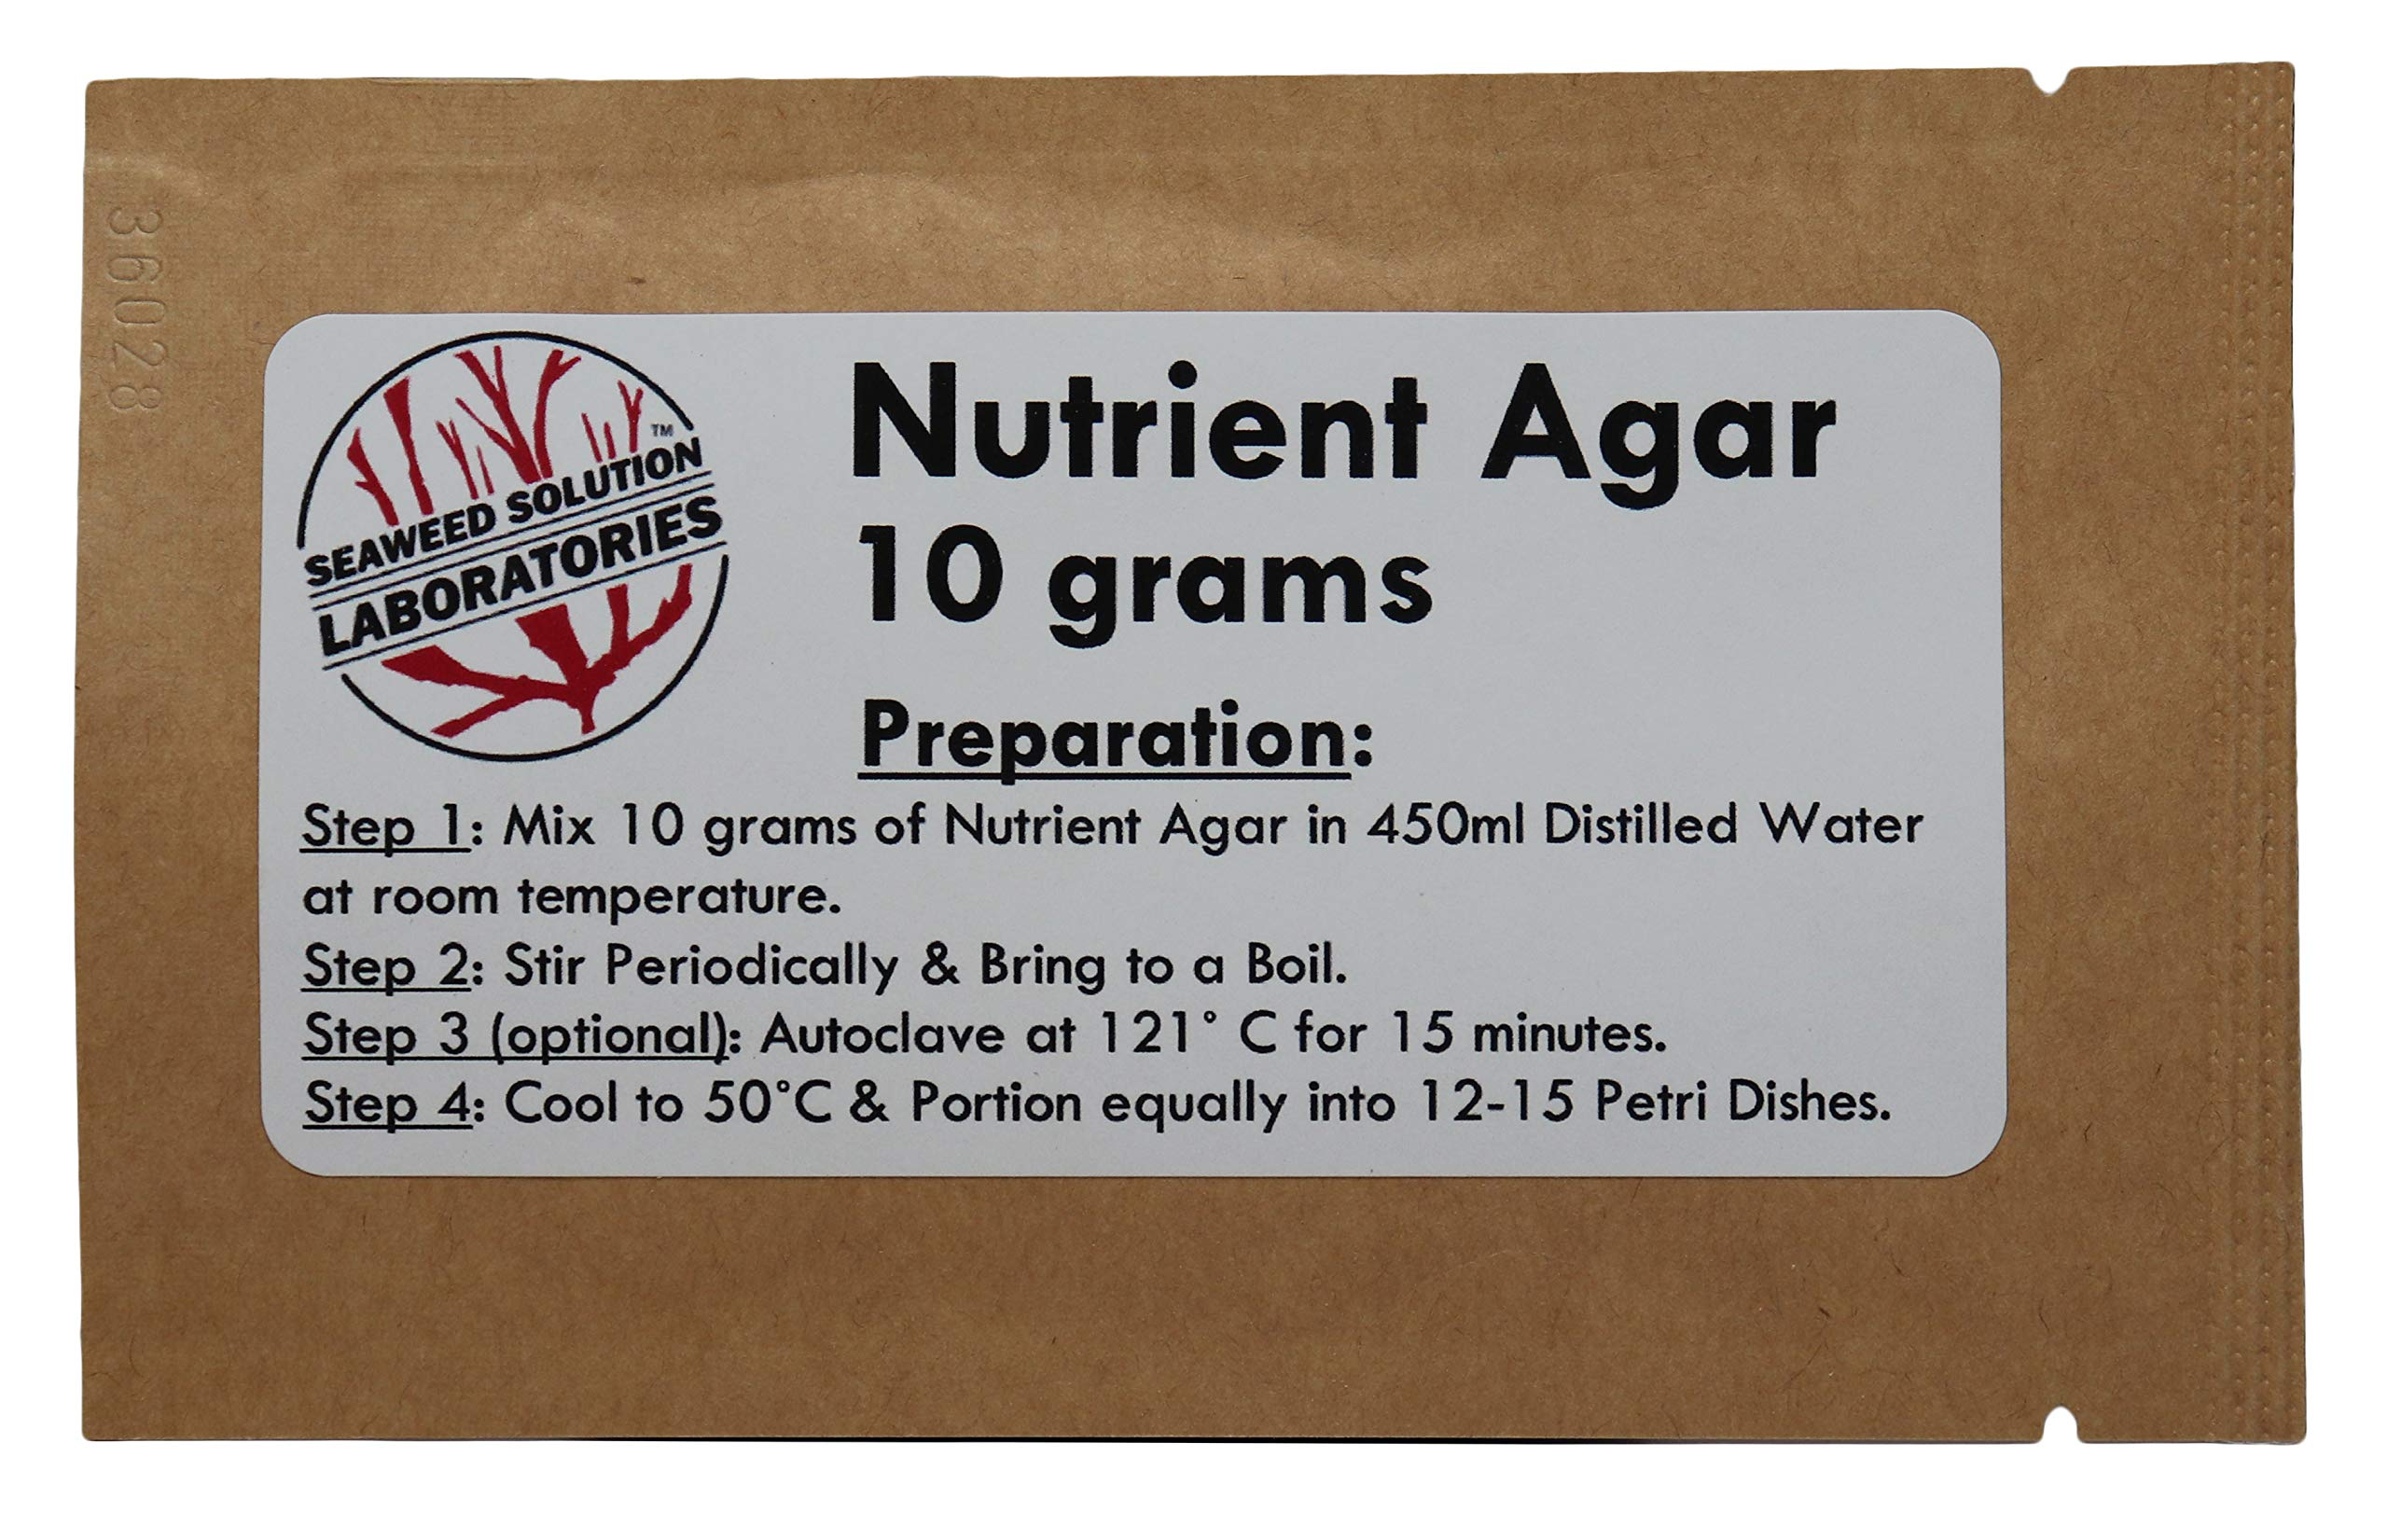 Nutrient Agar 10 Grams (Dehydrated) by Seaweed Solution Laboratories Nutrient Agar 10 grams